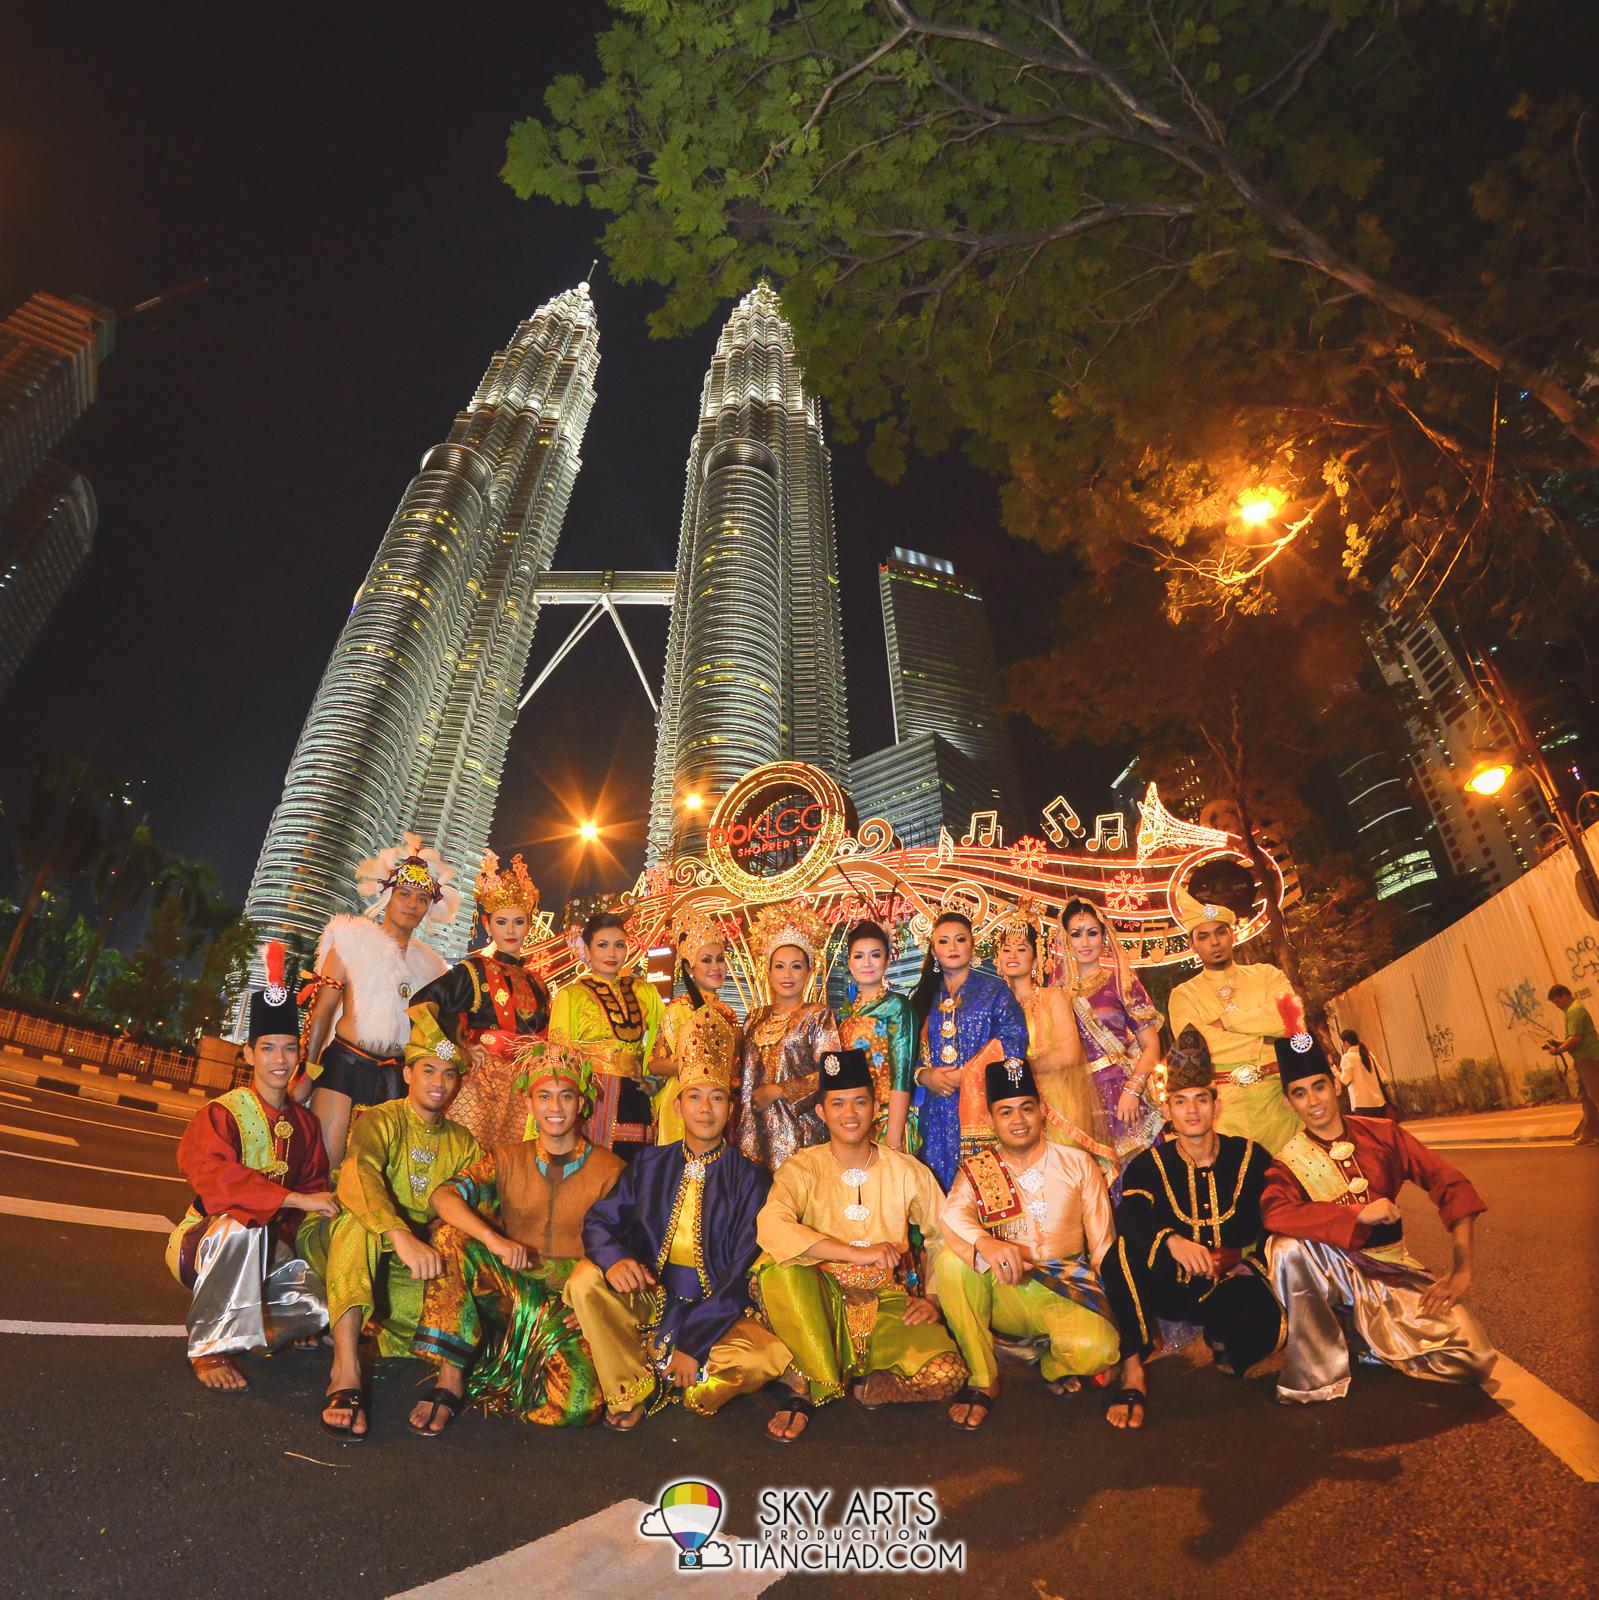 Citrawarna 2014 @ Jalan P. Ramlee Kuala Lumpur